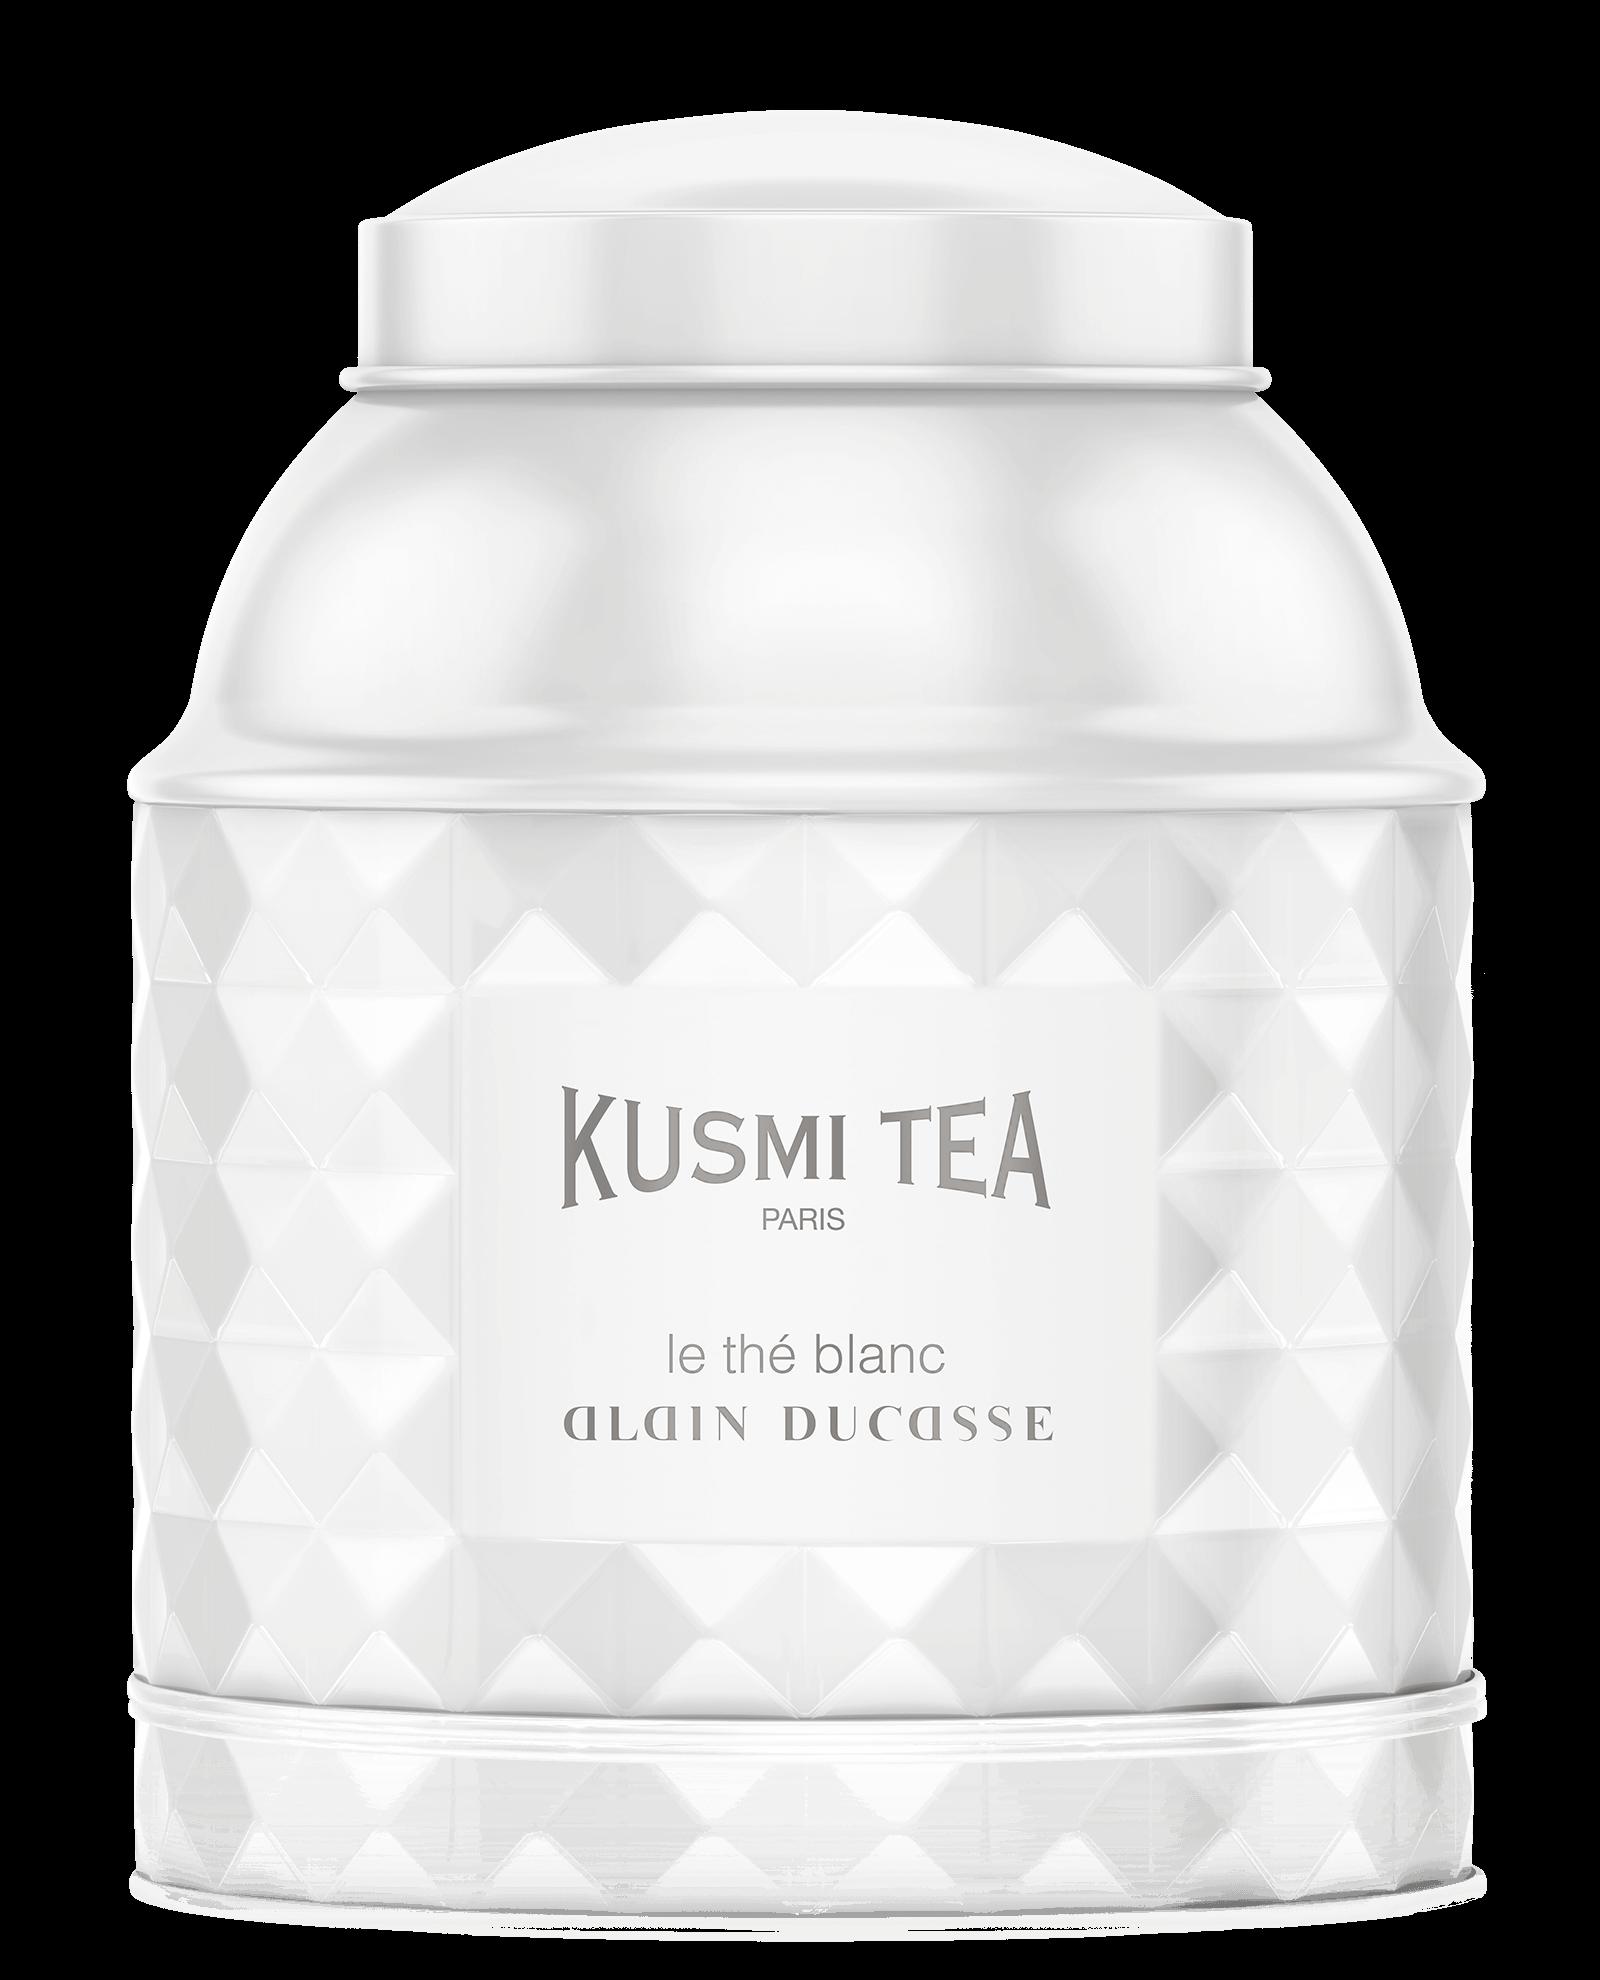 Thé blanc - Le Thé Blanc Alain Ducasse - Vrac - Kusmi Tea - thé blanc & vert aromatisé framboise - rose